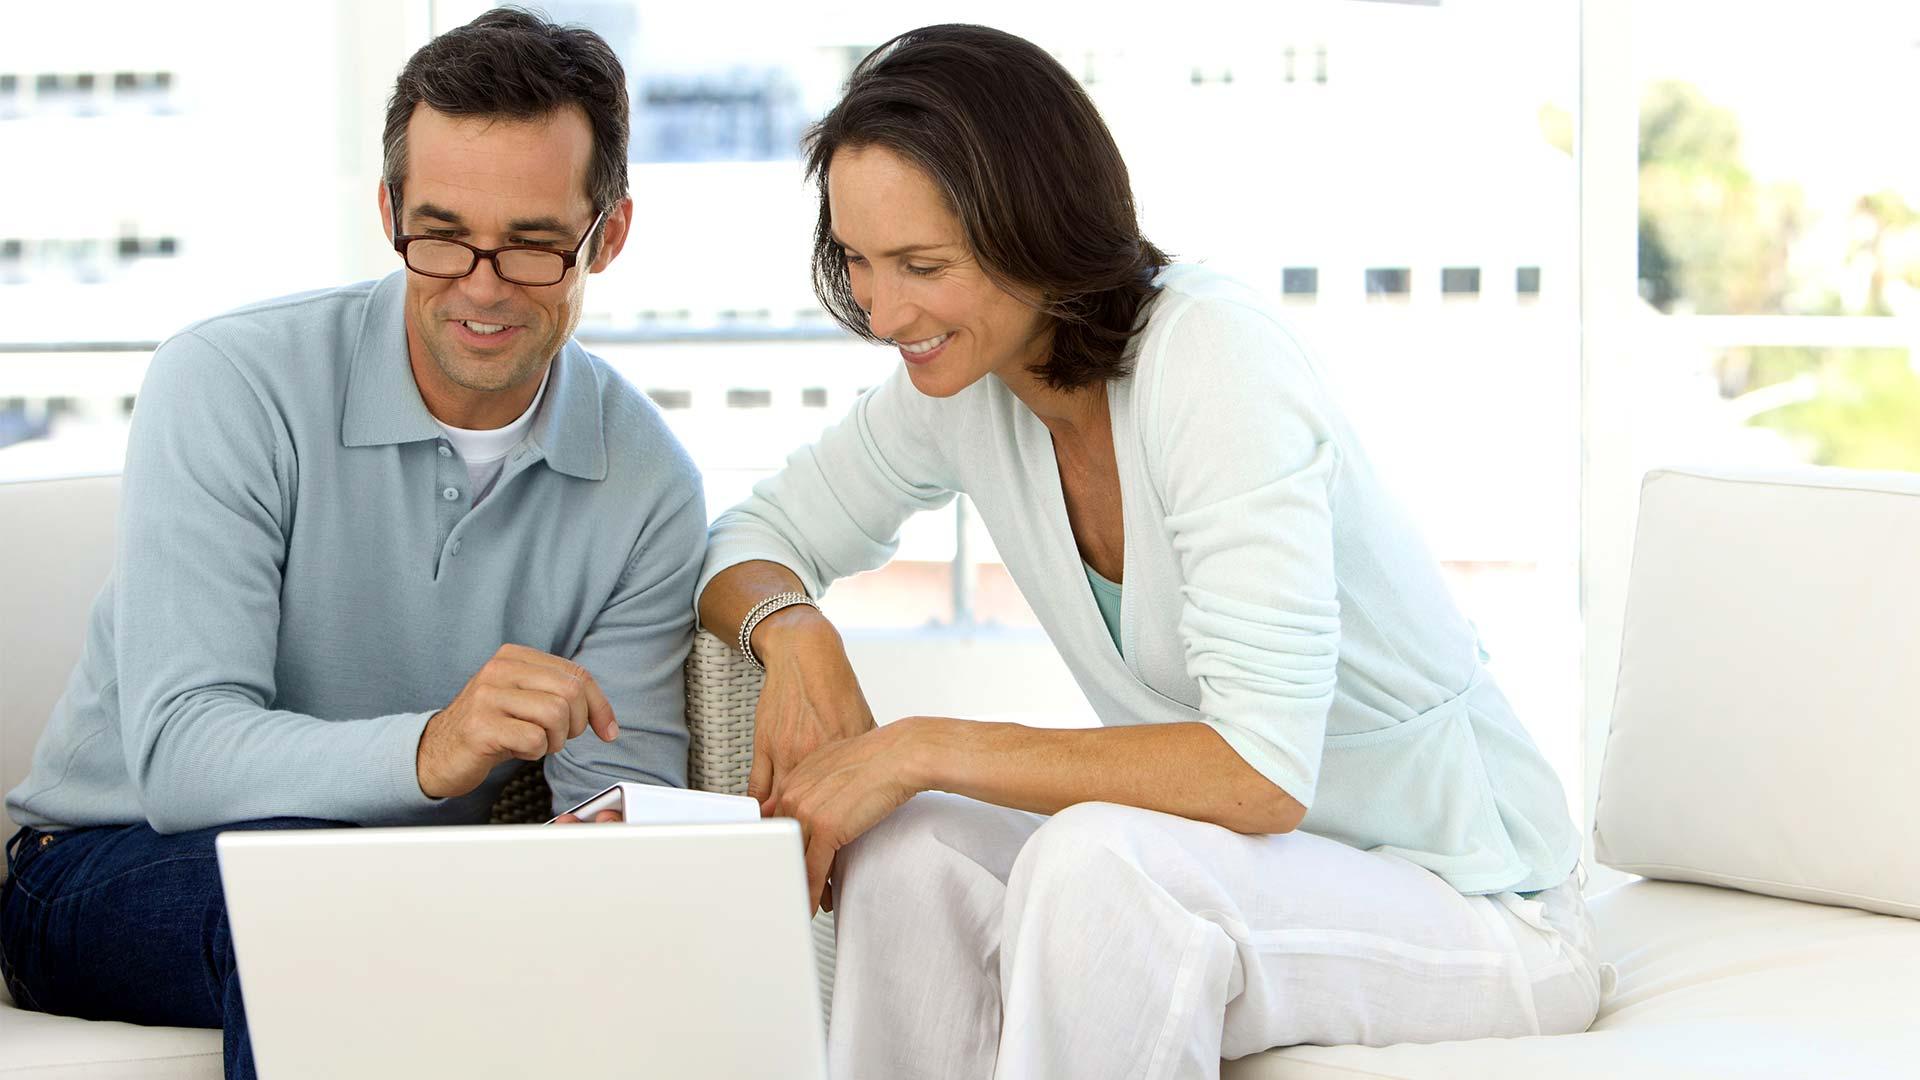 How-Do-I-Know-If-I-Should-Refinance-My-Home